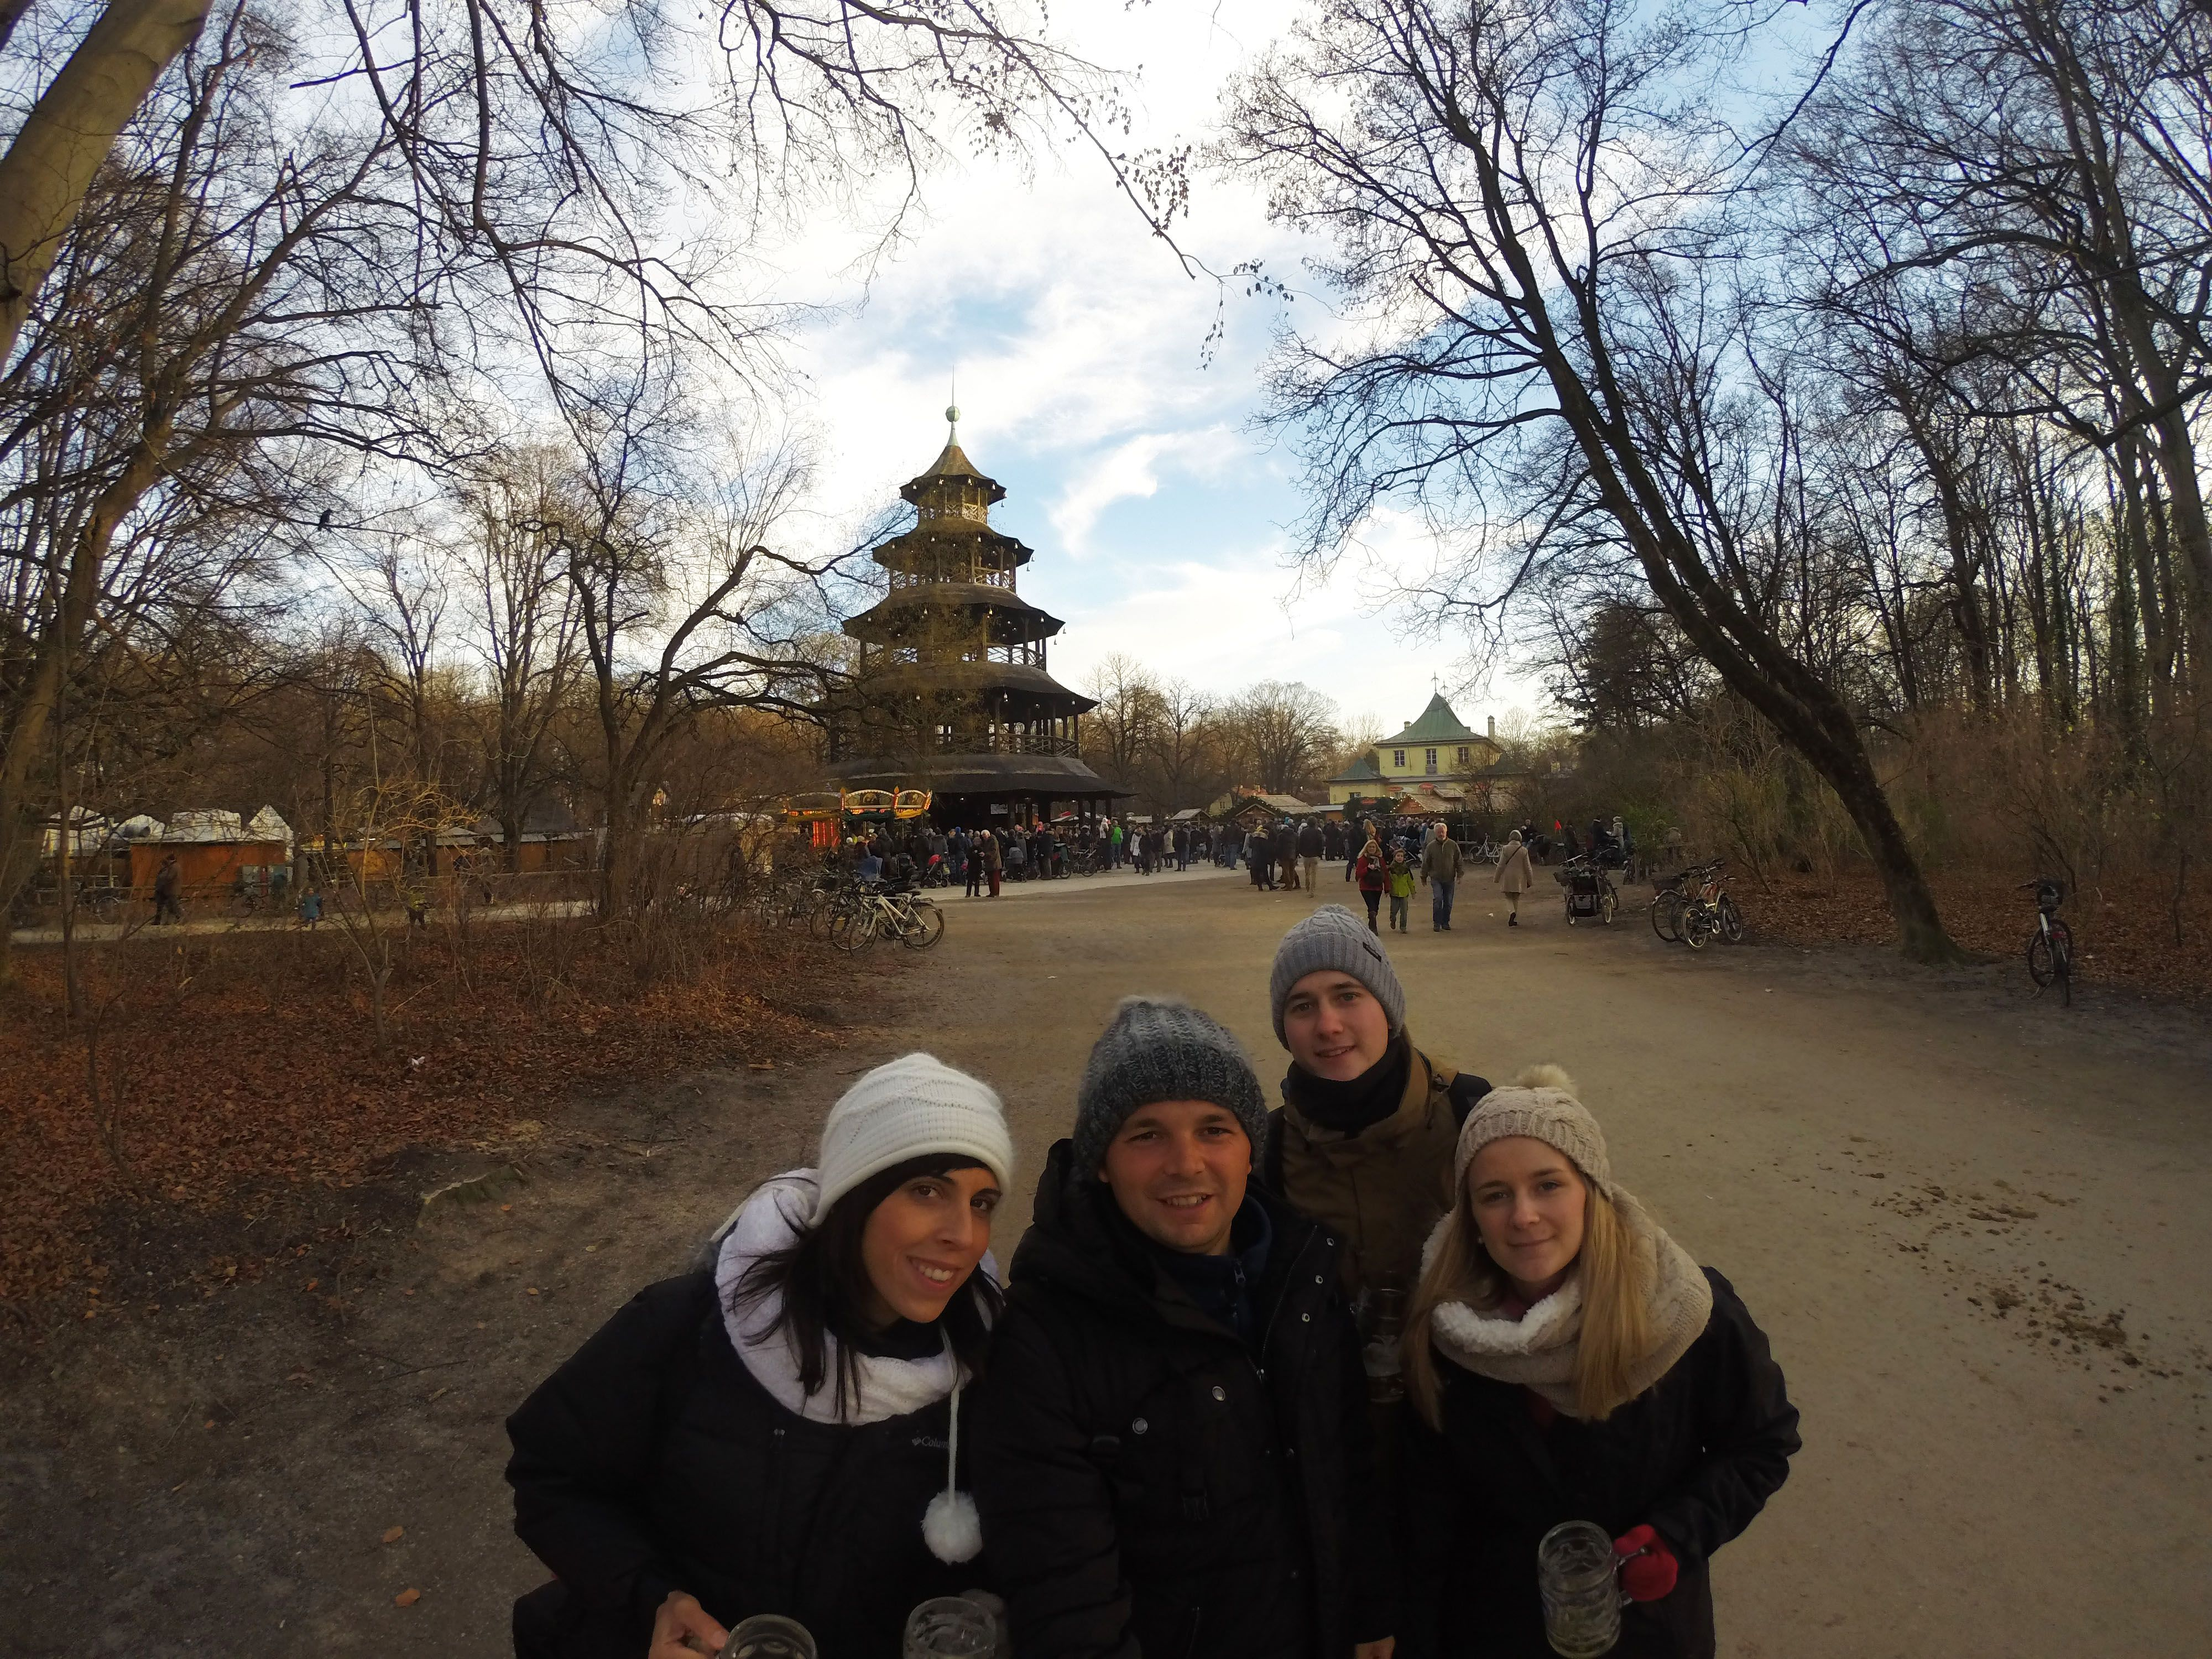 Chinesischer Turm, Mercado navideño